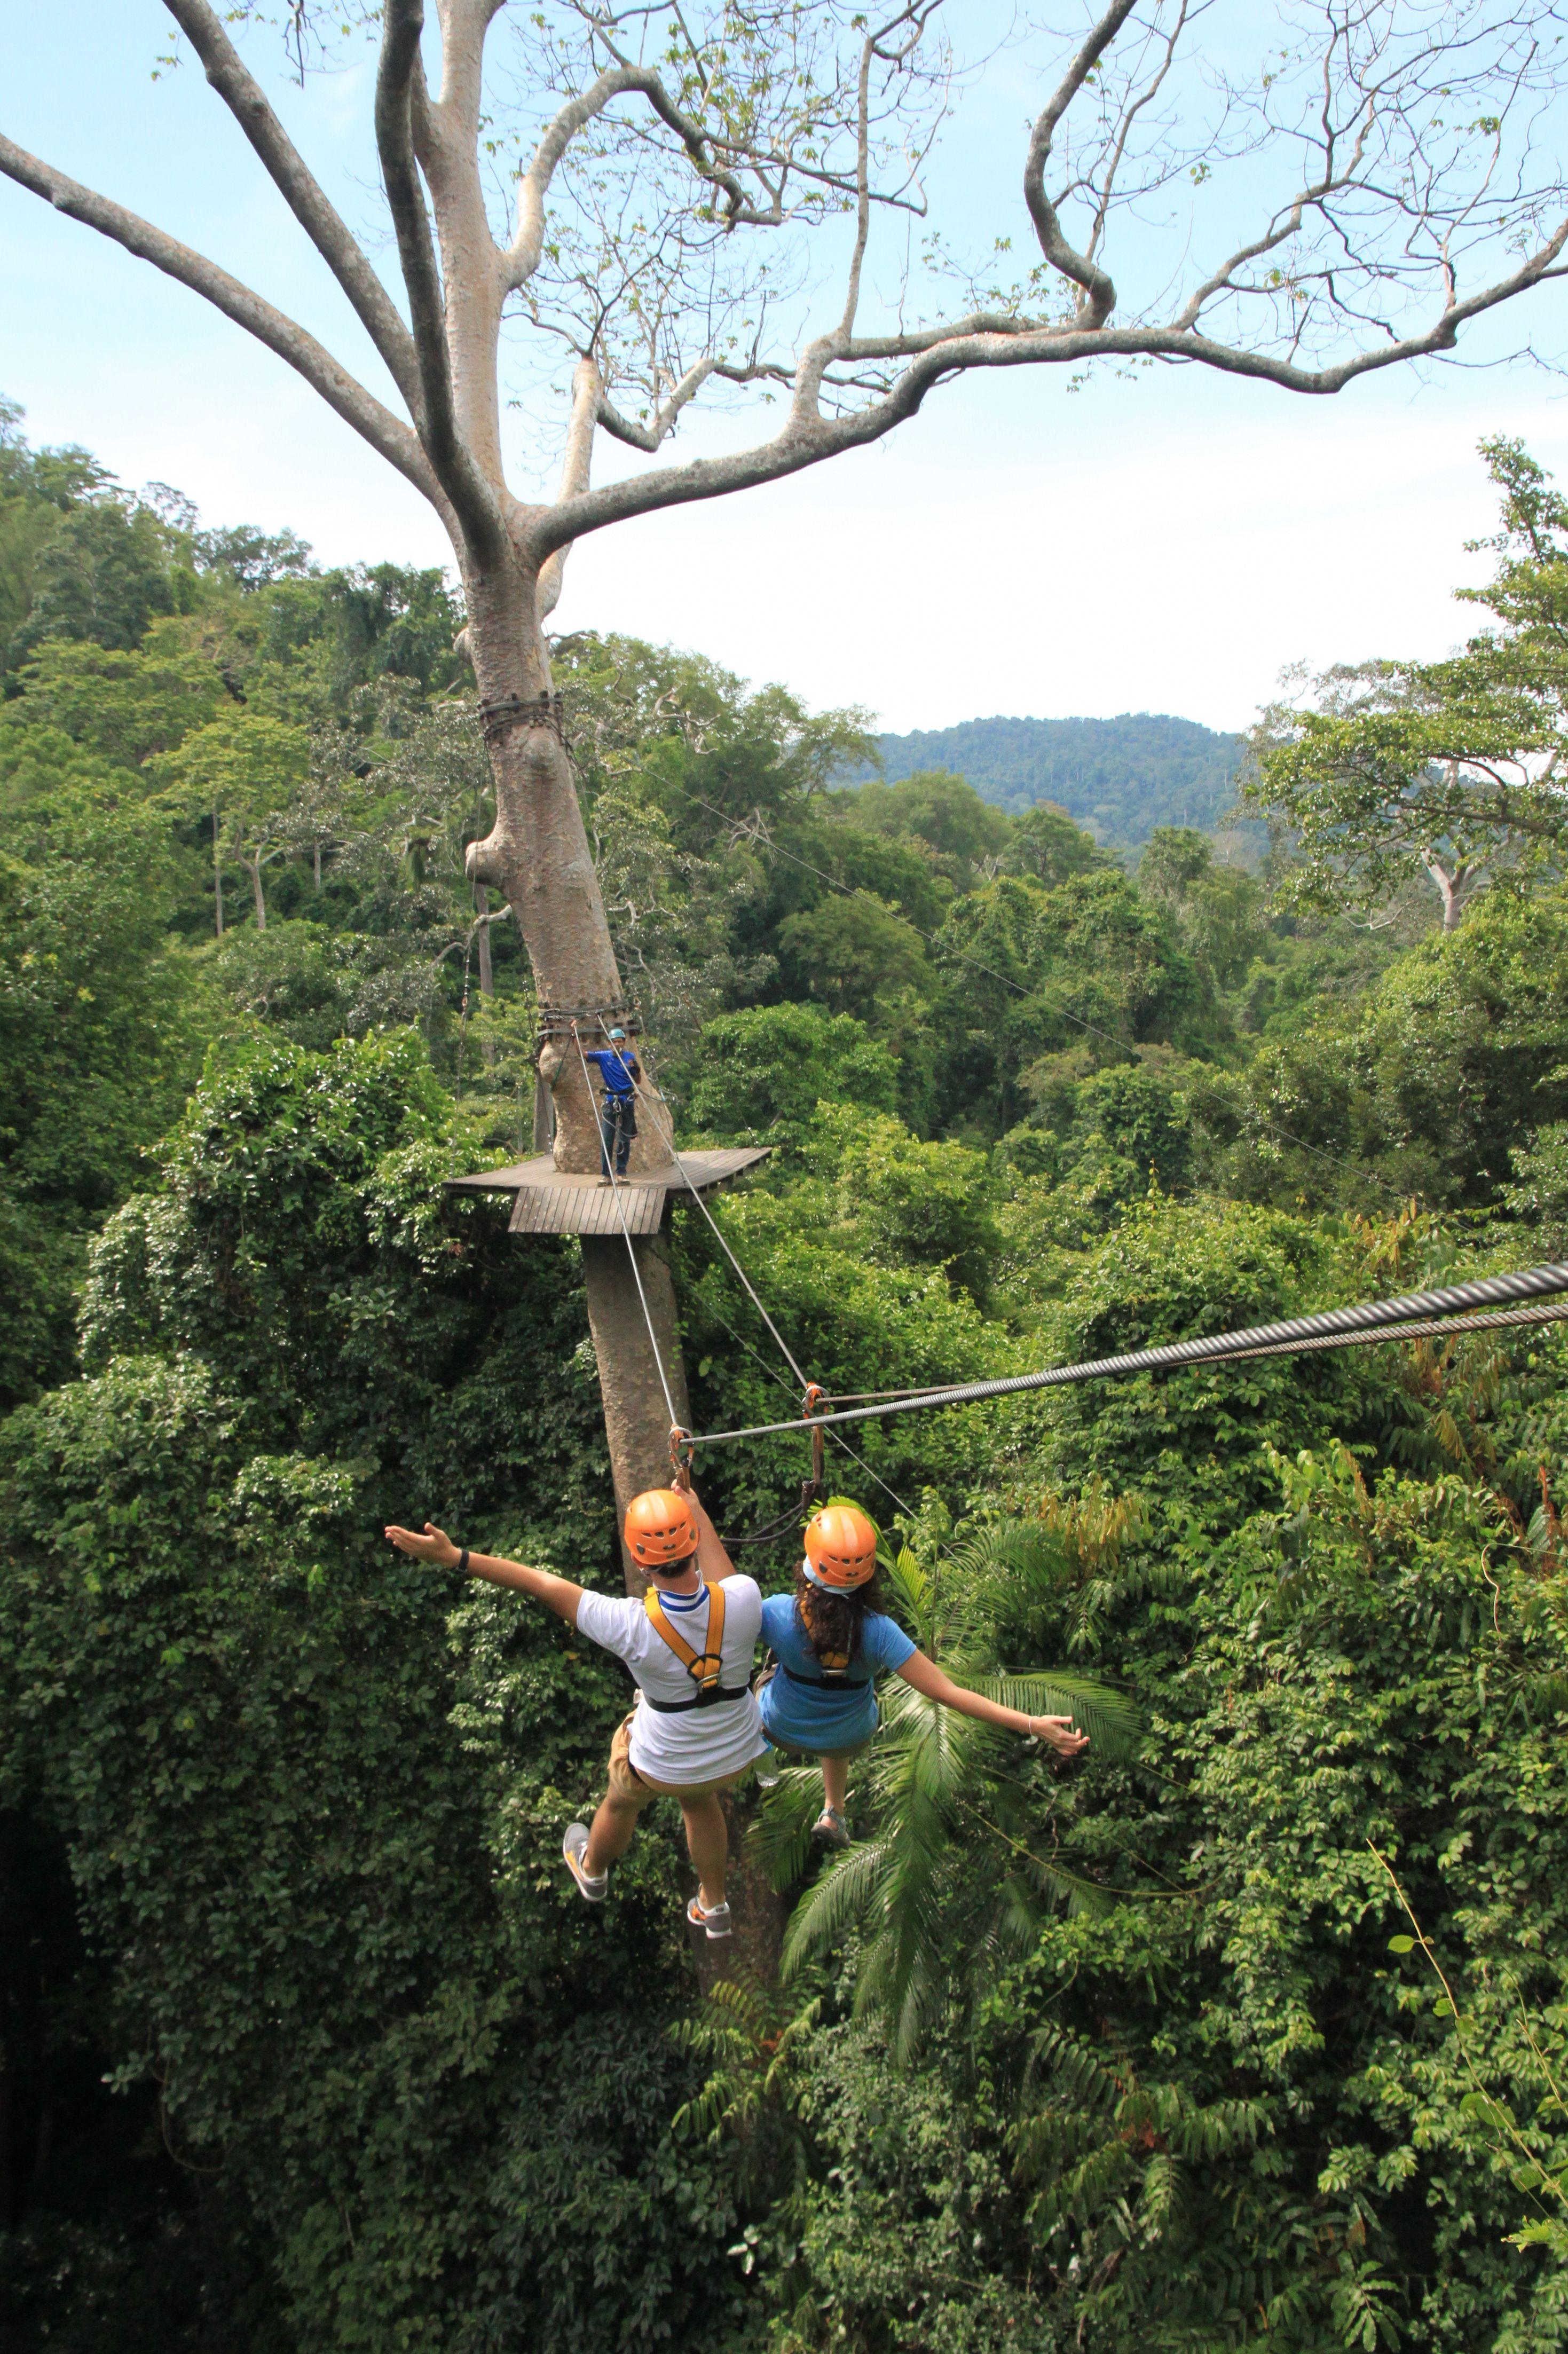 The Closest Zipline Canopy Tour To Bangkok Or Pattaya Ziplining Exploring Adventure Adventure Travel